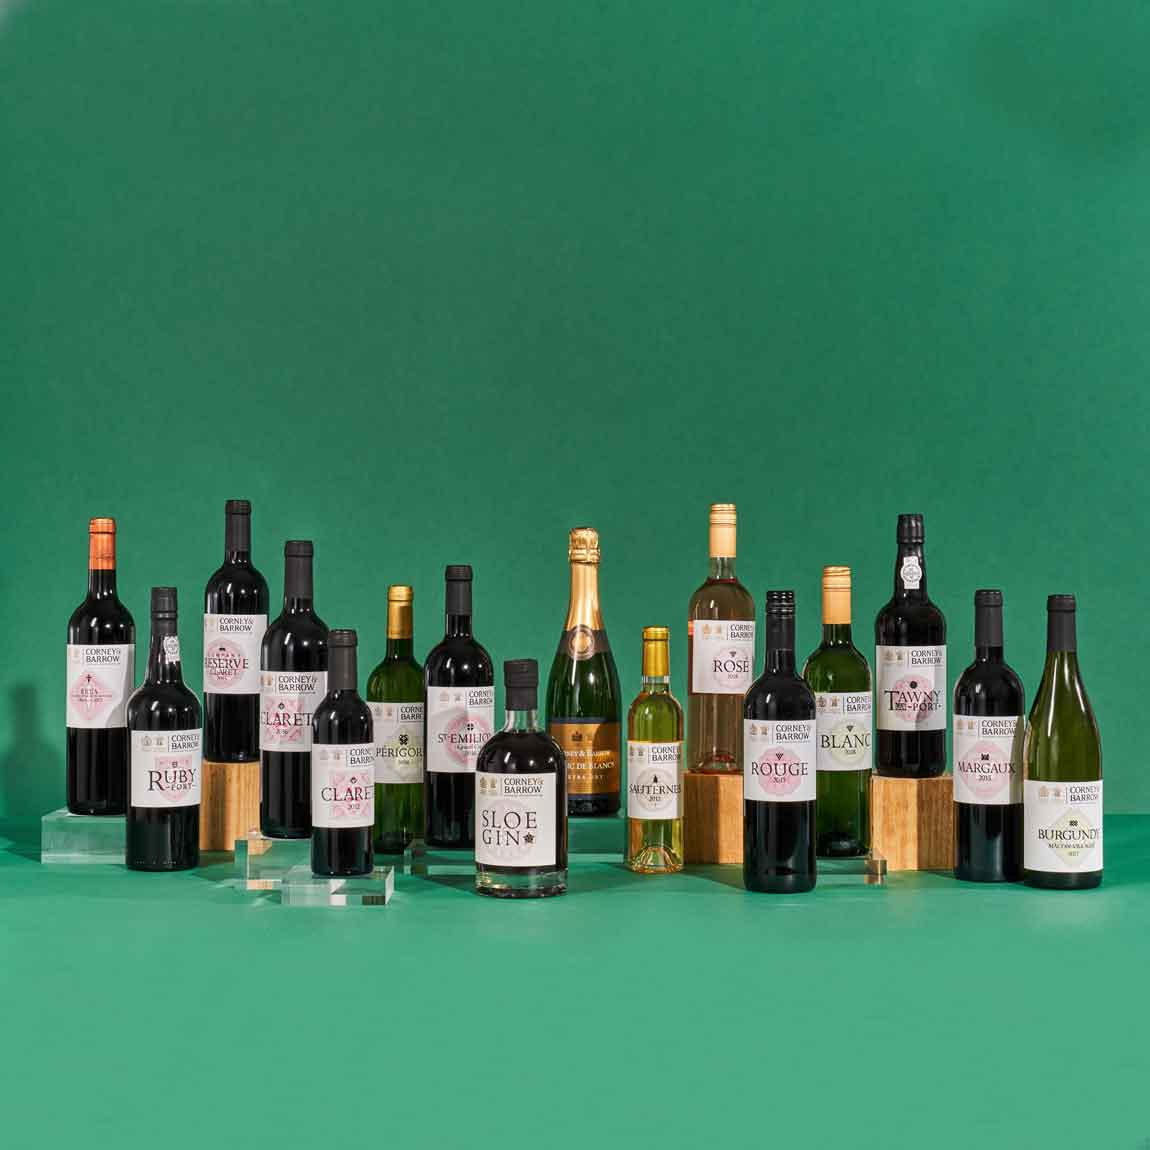 Corney & Barrow Own Labels